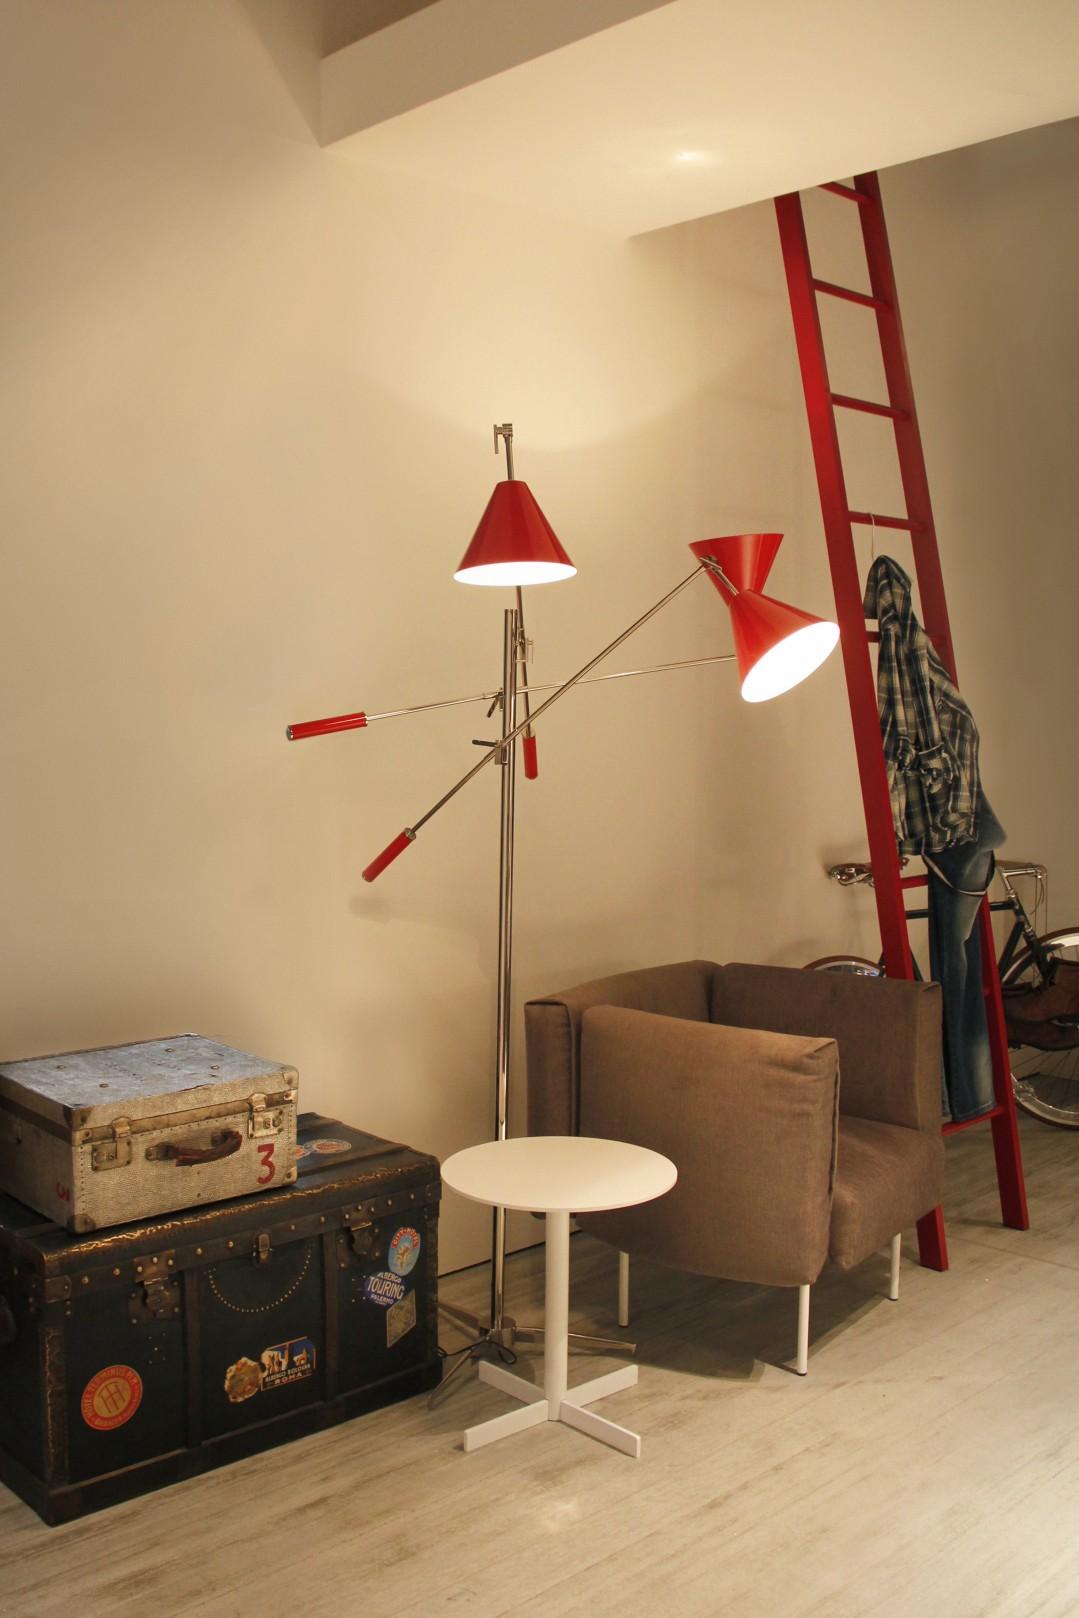 modern floor lamps Modern Floor Lamps In An All Red Everything Decor! Modern Floor Lamps In An All Red Everything Decor 6